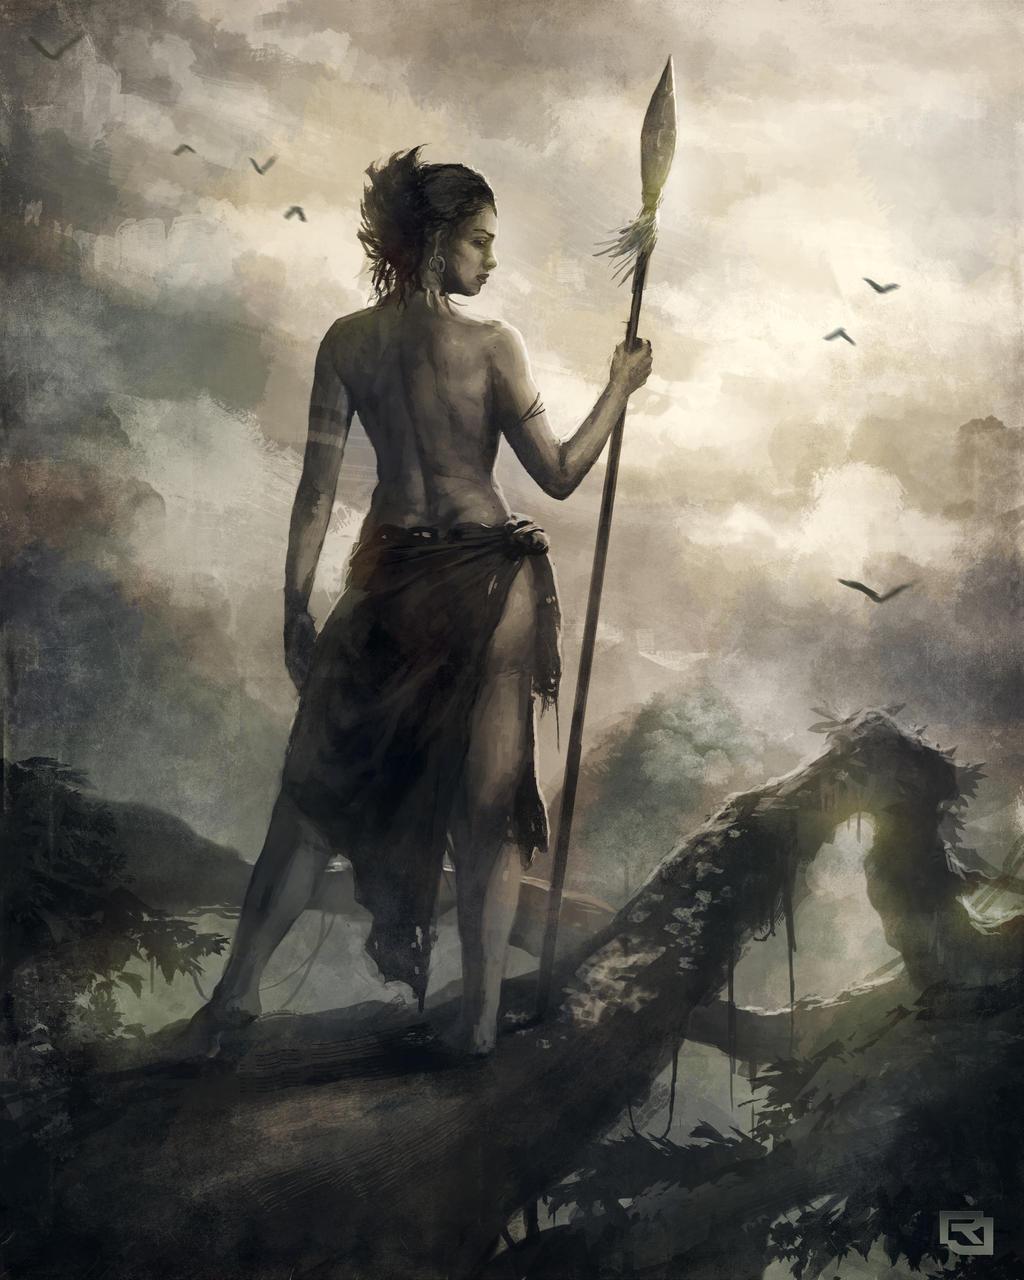 Warrior woman by rob joseph on deviantart